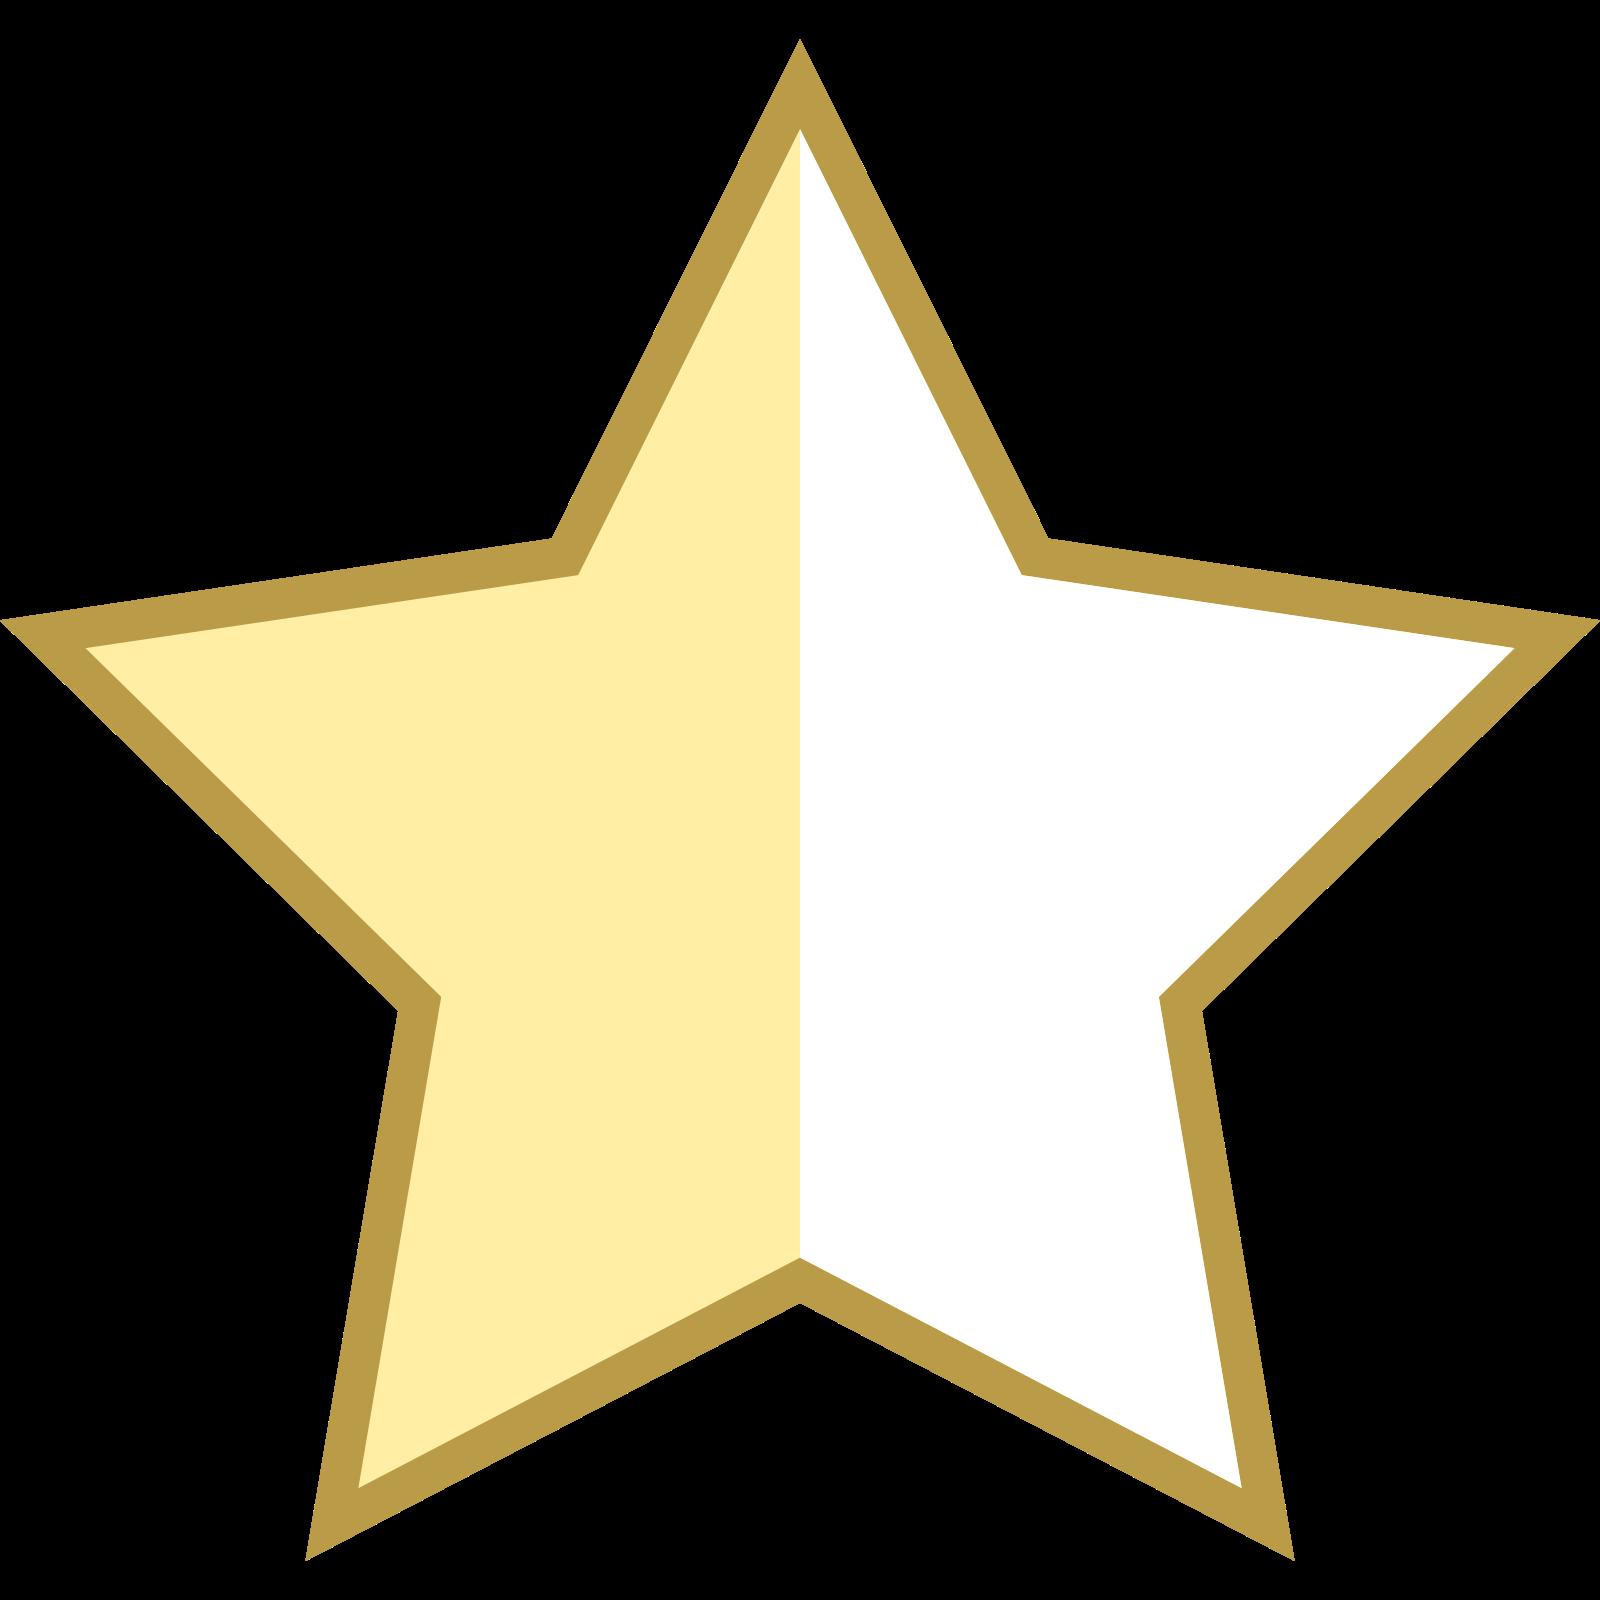 Star Half Empty icon